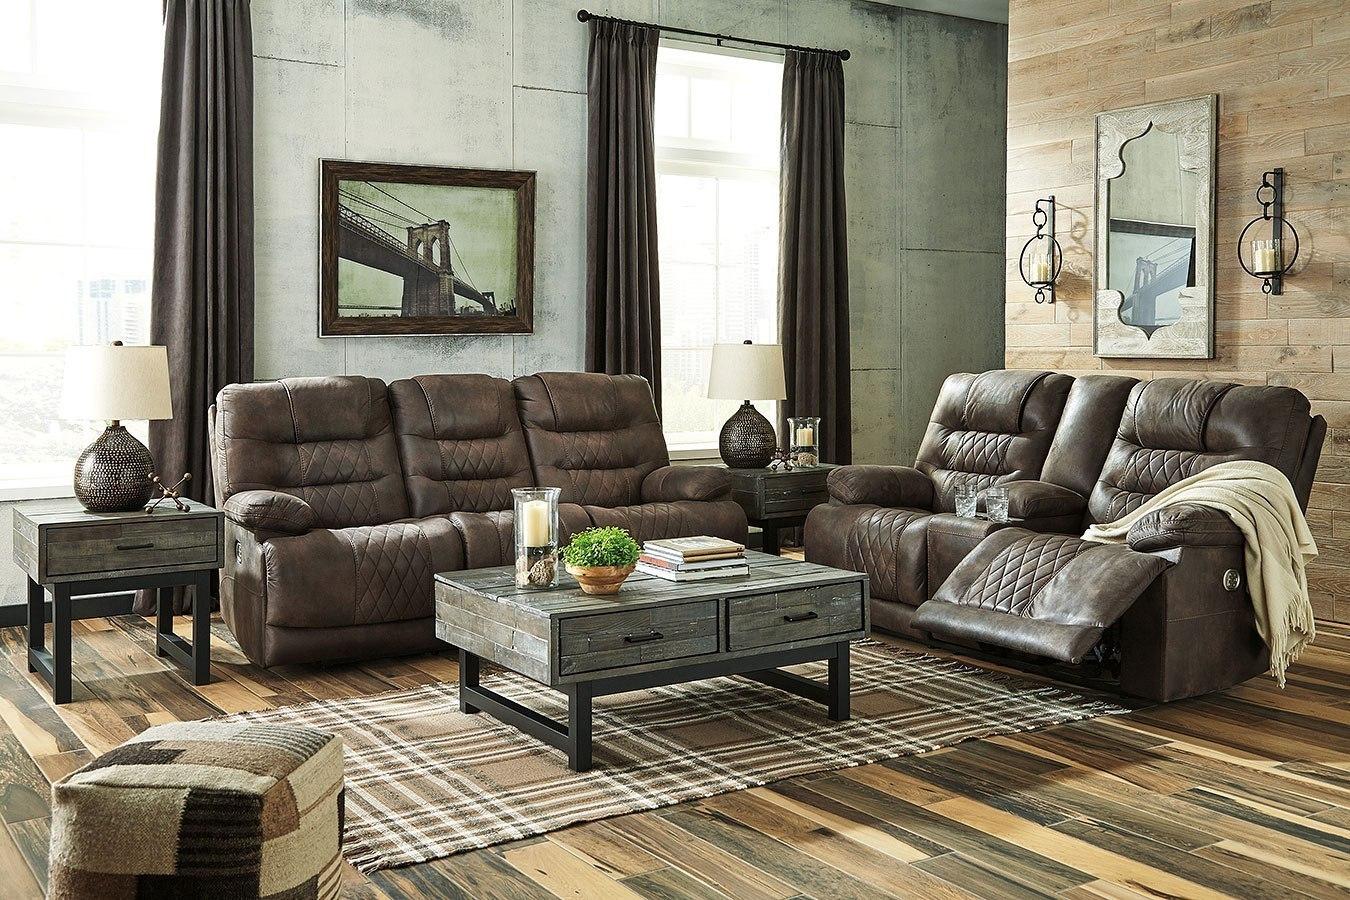 welsford walnut power reclining living room set w. Black Bedroom Furniture Sets. Home Design Ideas